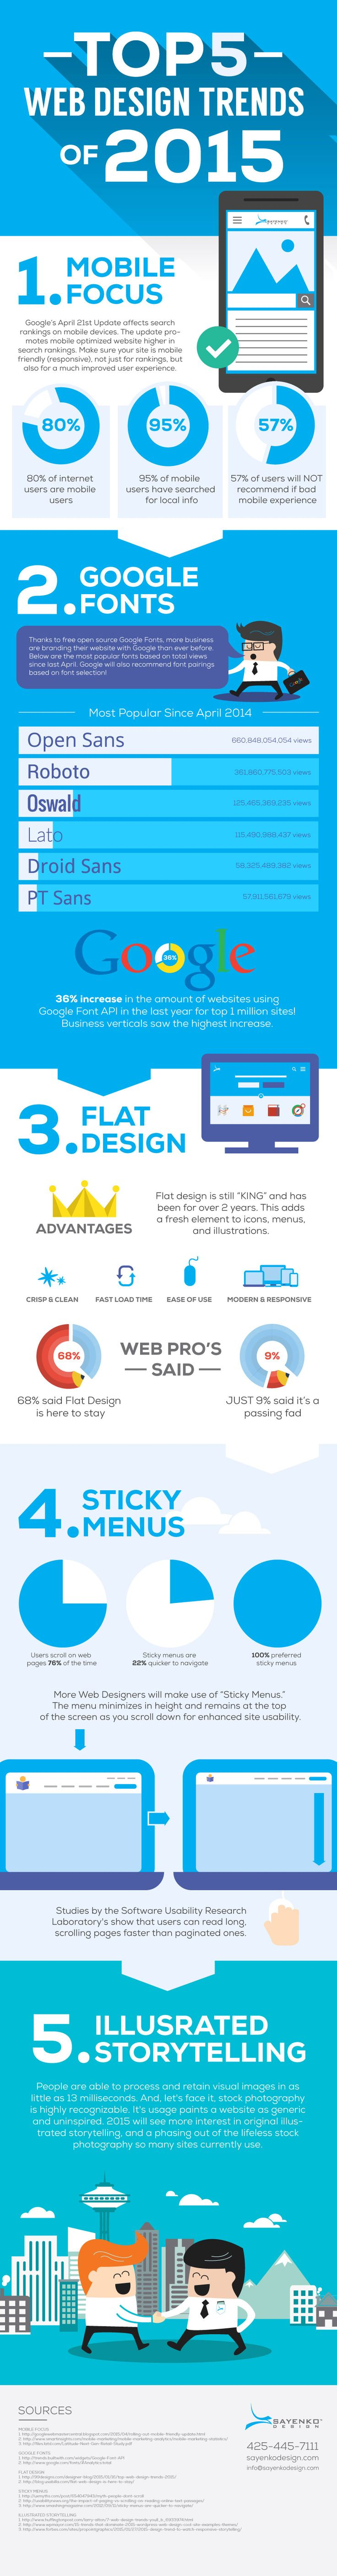 tendances webdesign 2015